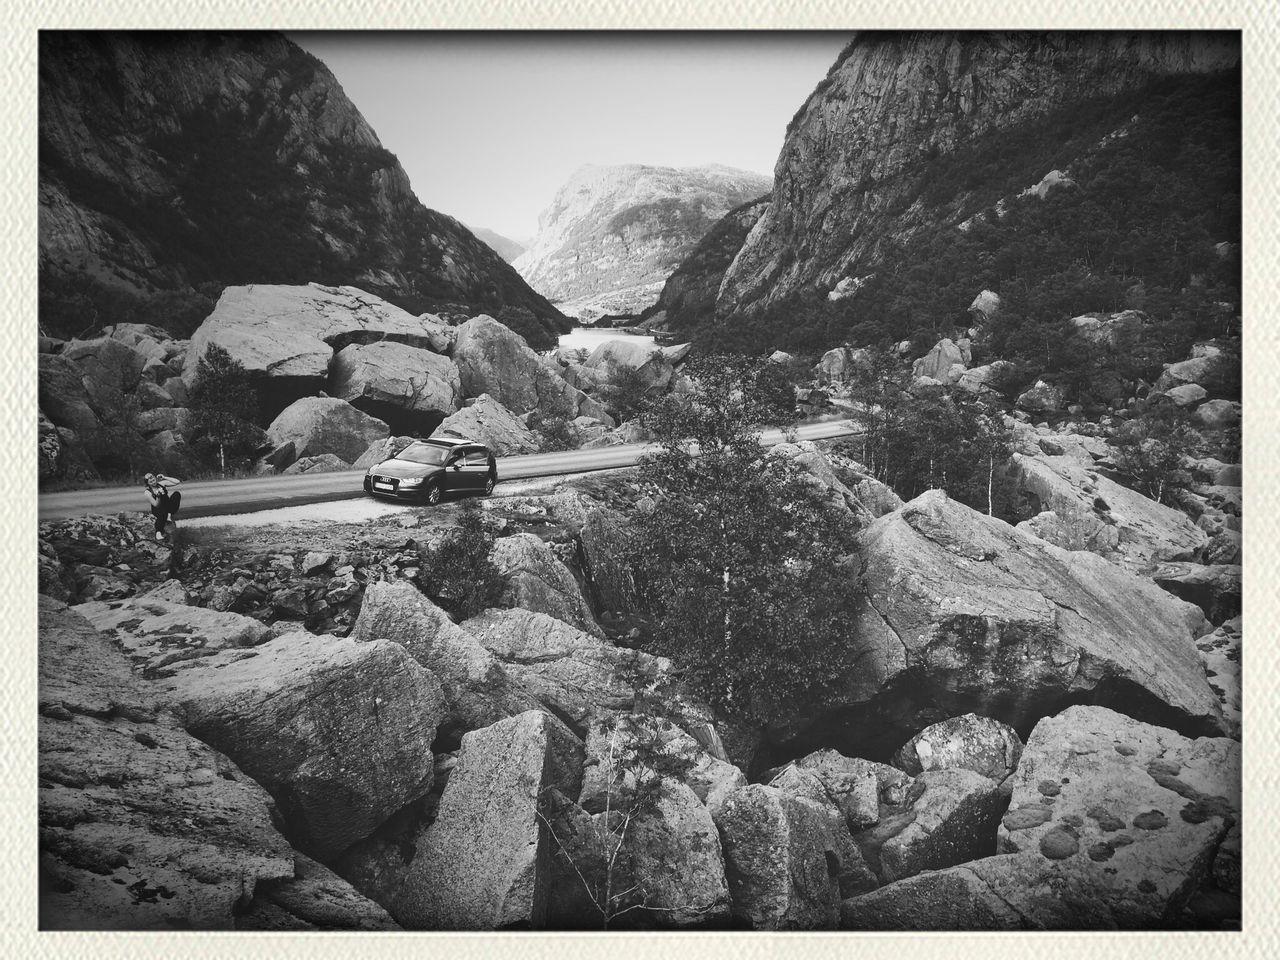 Spectecular Stones Stonework Rough Gigantic Huge Mountains Tiny Dessert Black And White Blackandwhite Photography